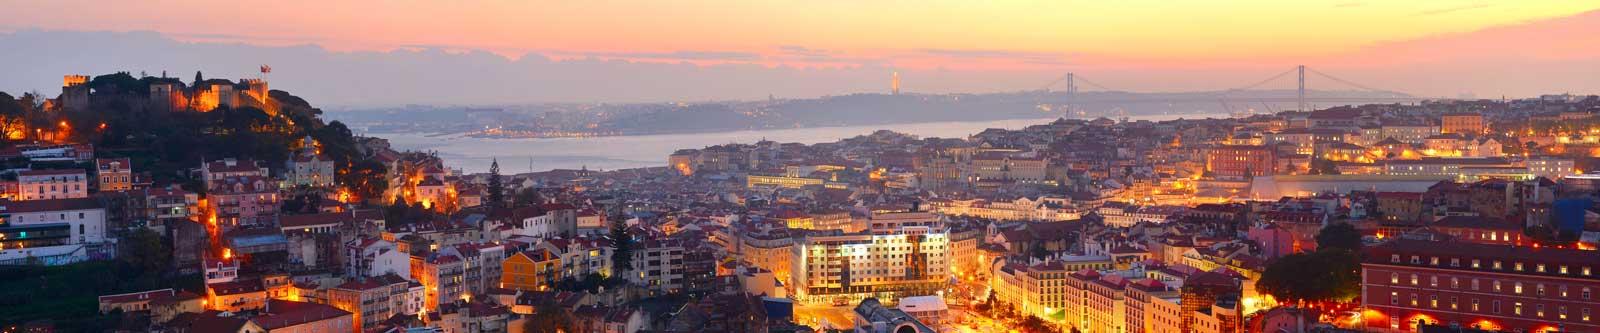 Portugal Golden Visa Program's 350k Euros Fund Option